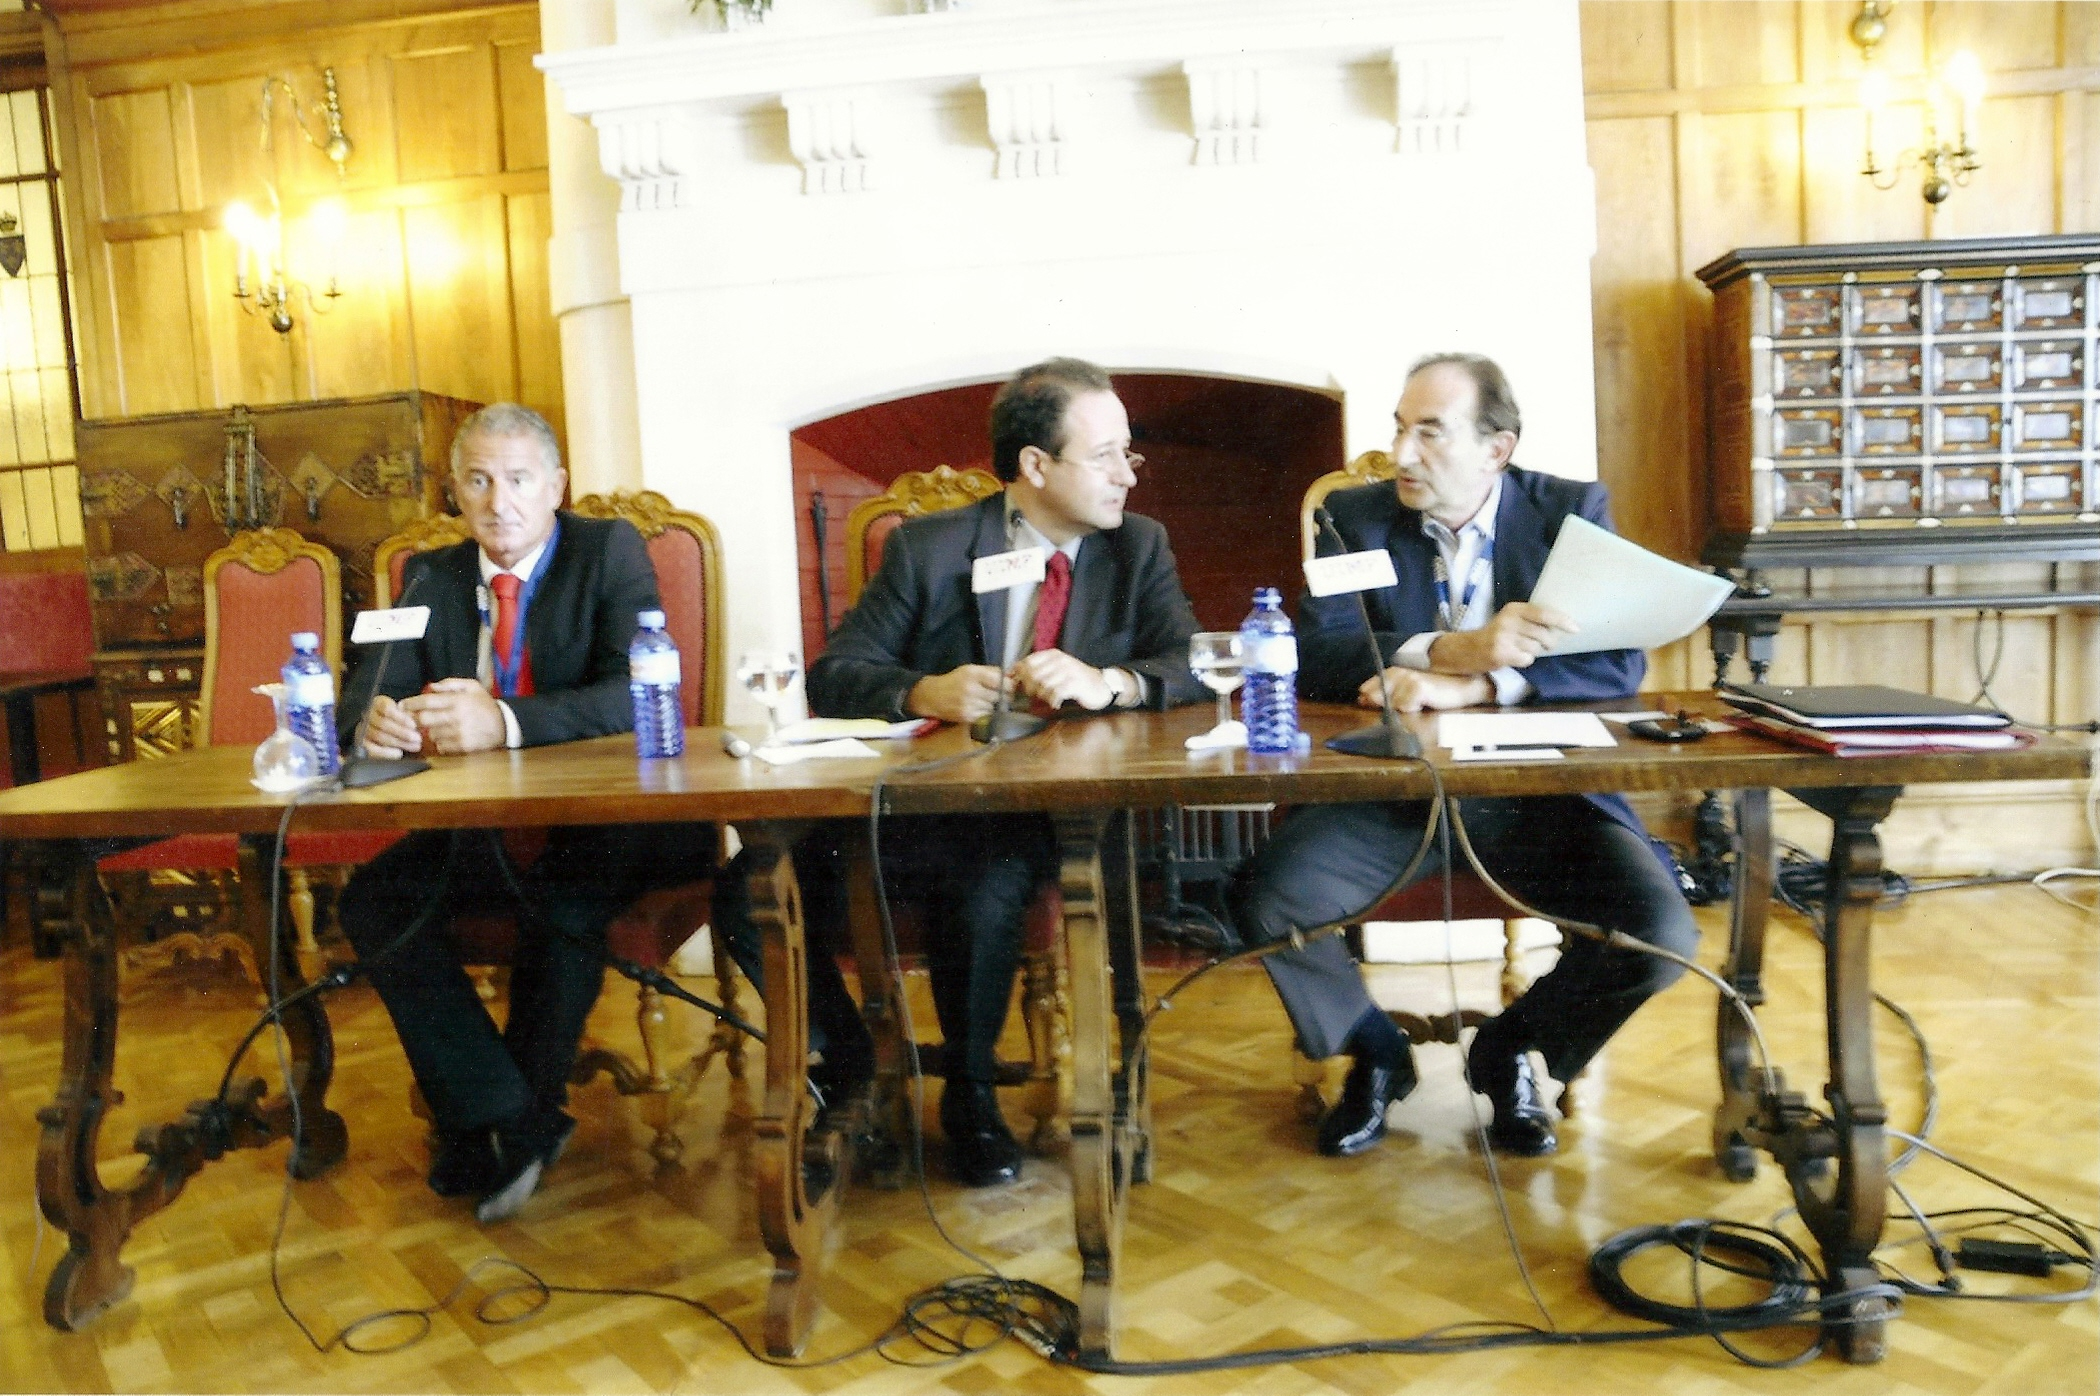 "Augusto Soto with Professor Emilio Lamo de Espinosa and Professor Rafael Domínguez, ""España ante la relación China-Iberoamérica"", Menéndez Pelayo International University, Santander, July 2010."